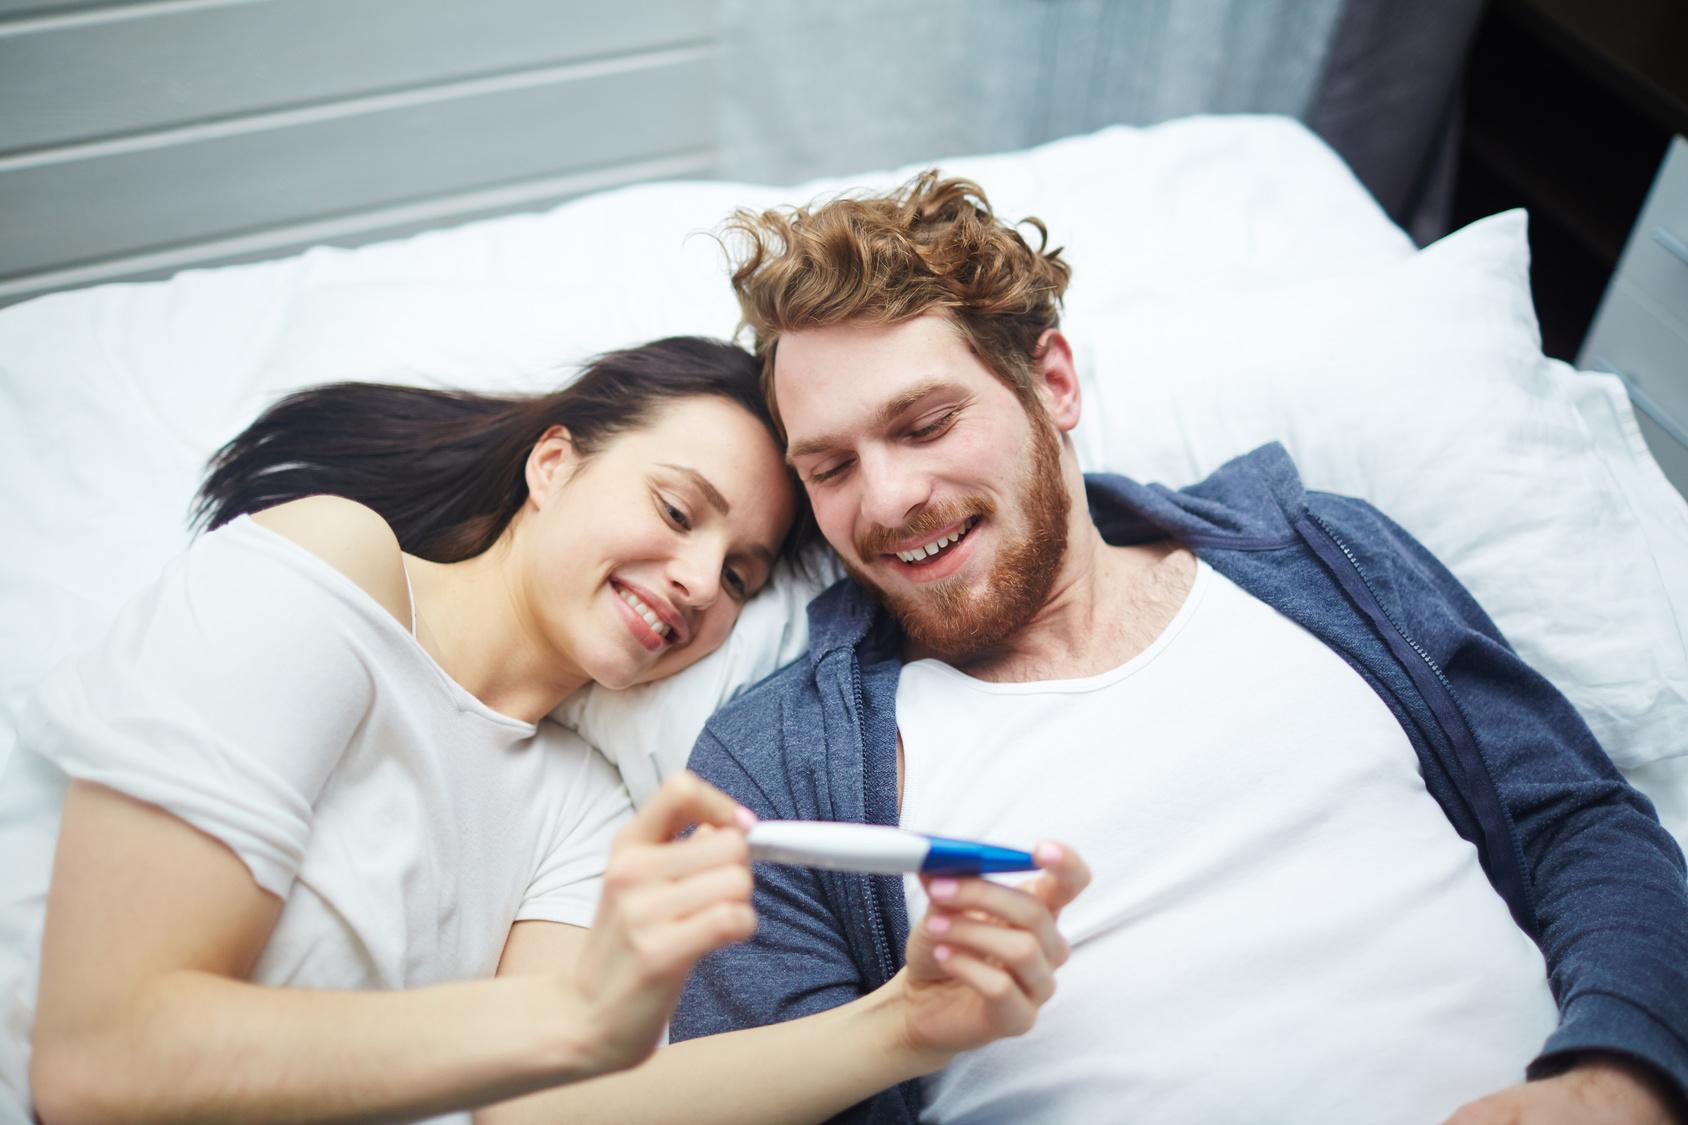 enceinte maman fils sexe histoire